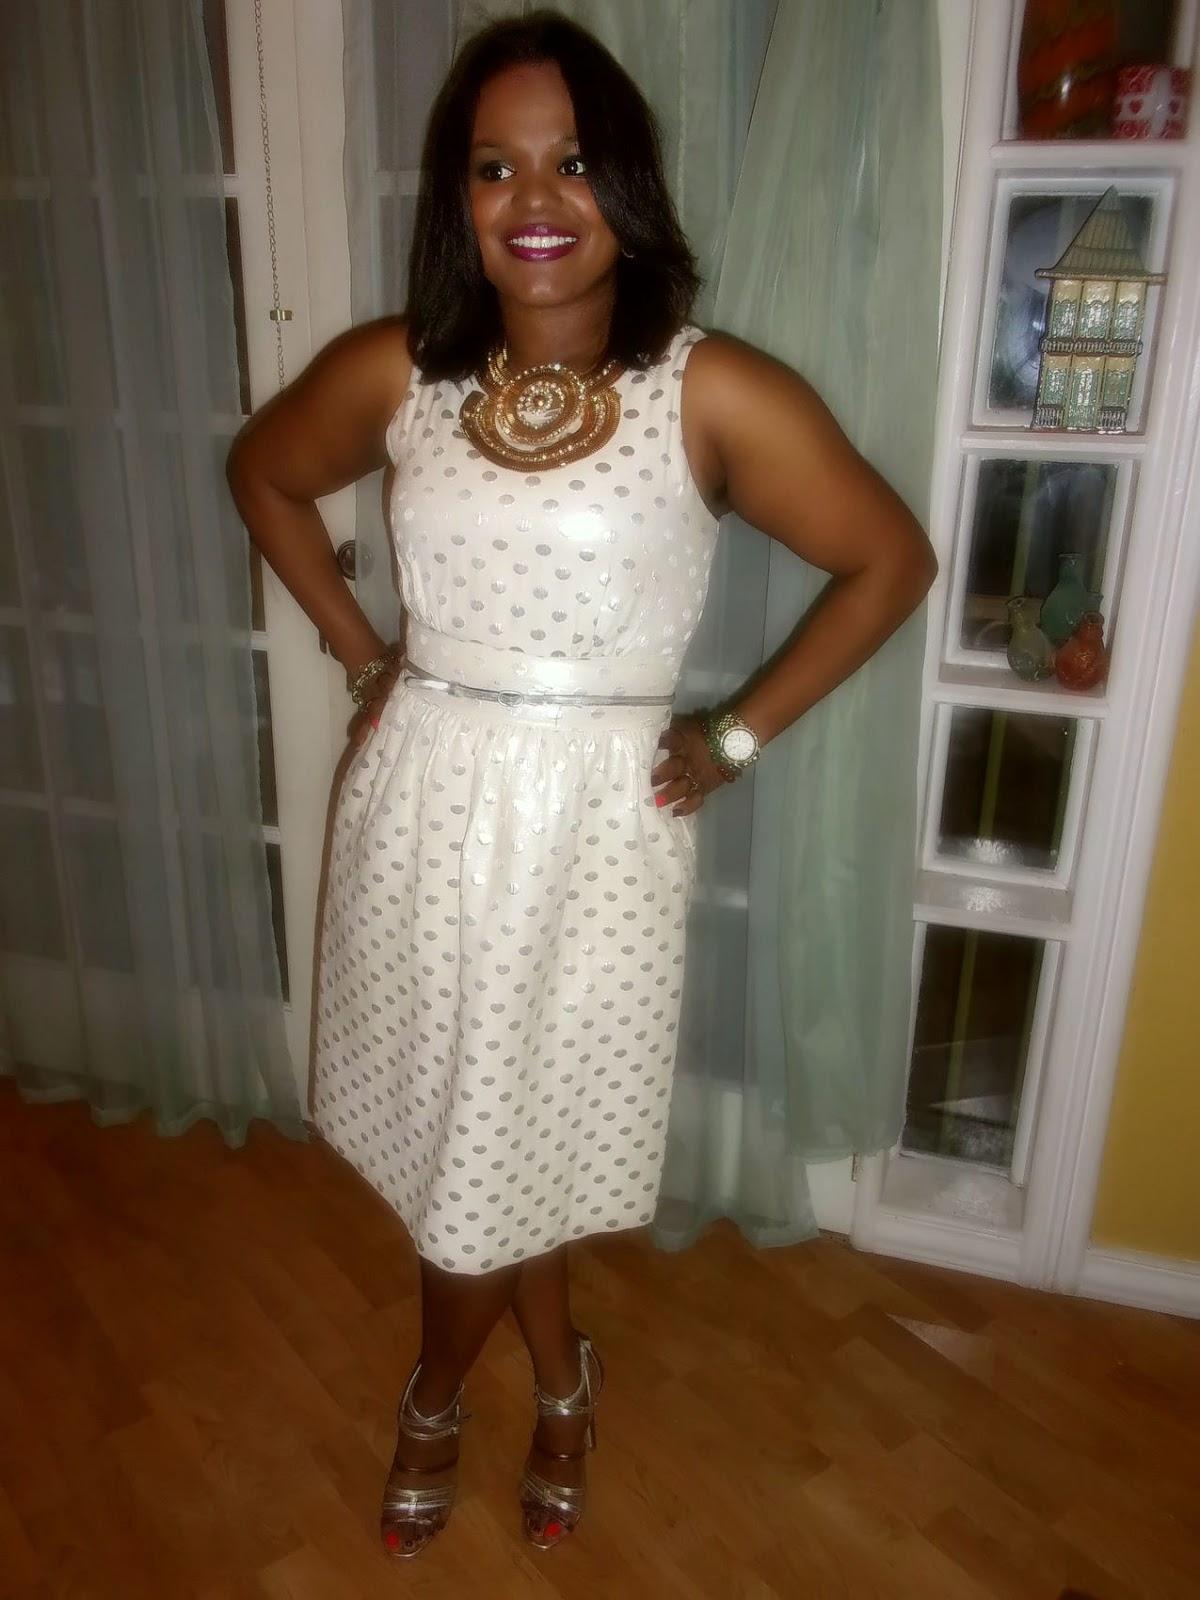 LaMoumous Fashion Blog: Silver Polka Dot & Statement Gold ...